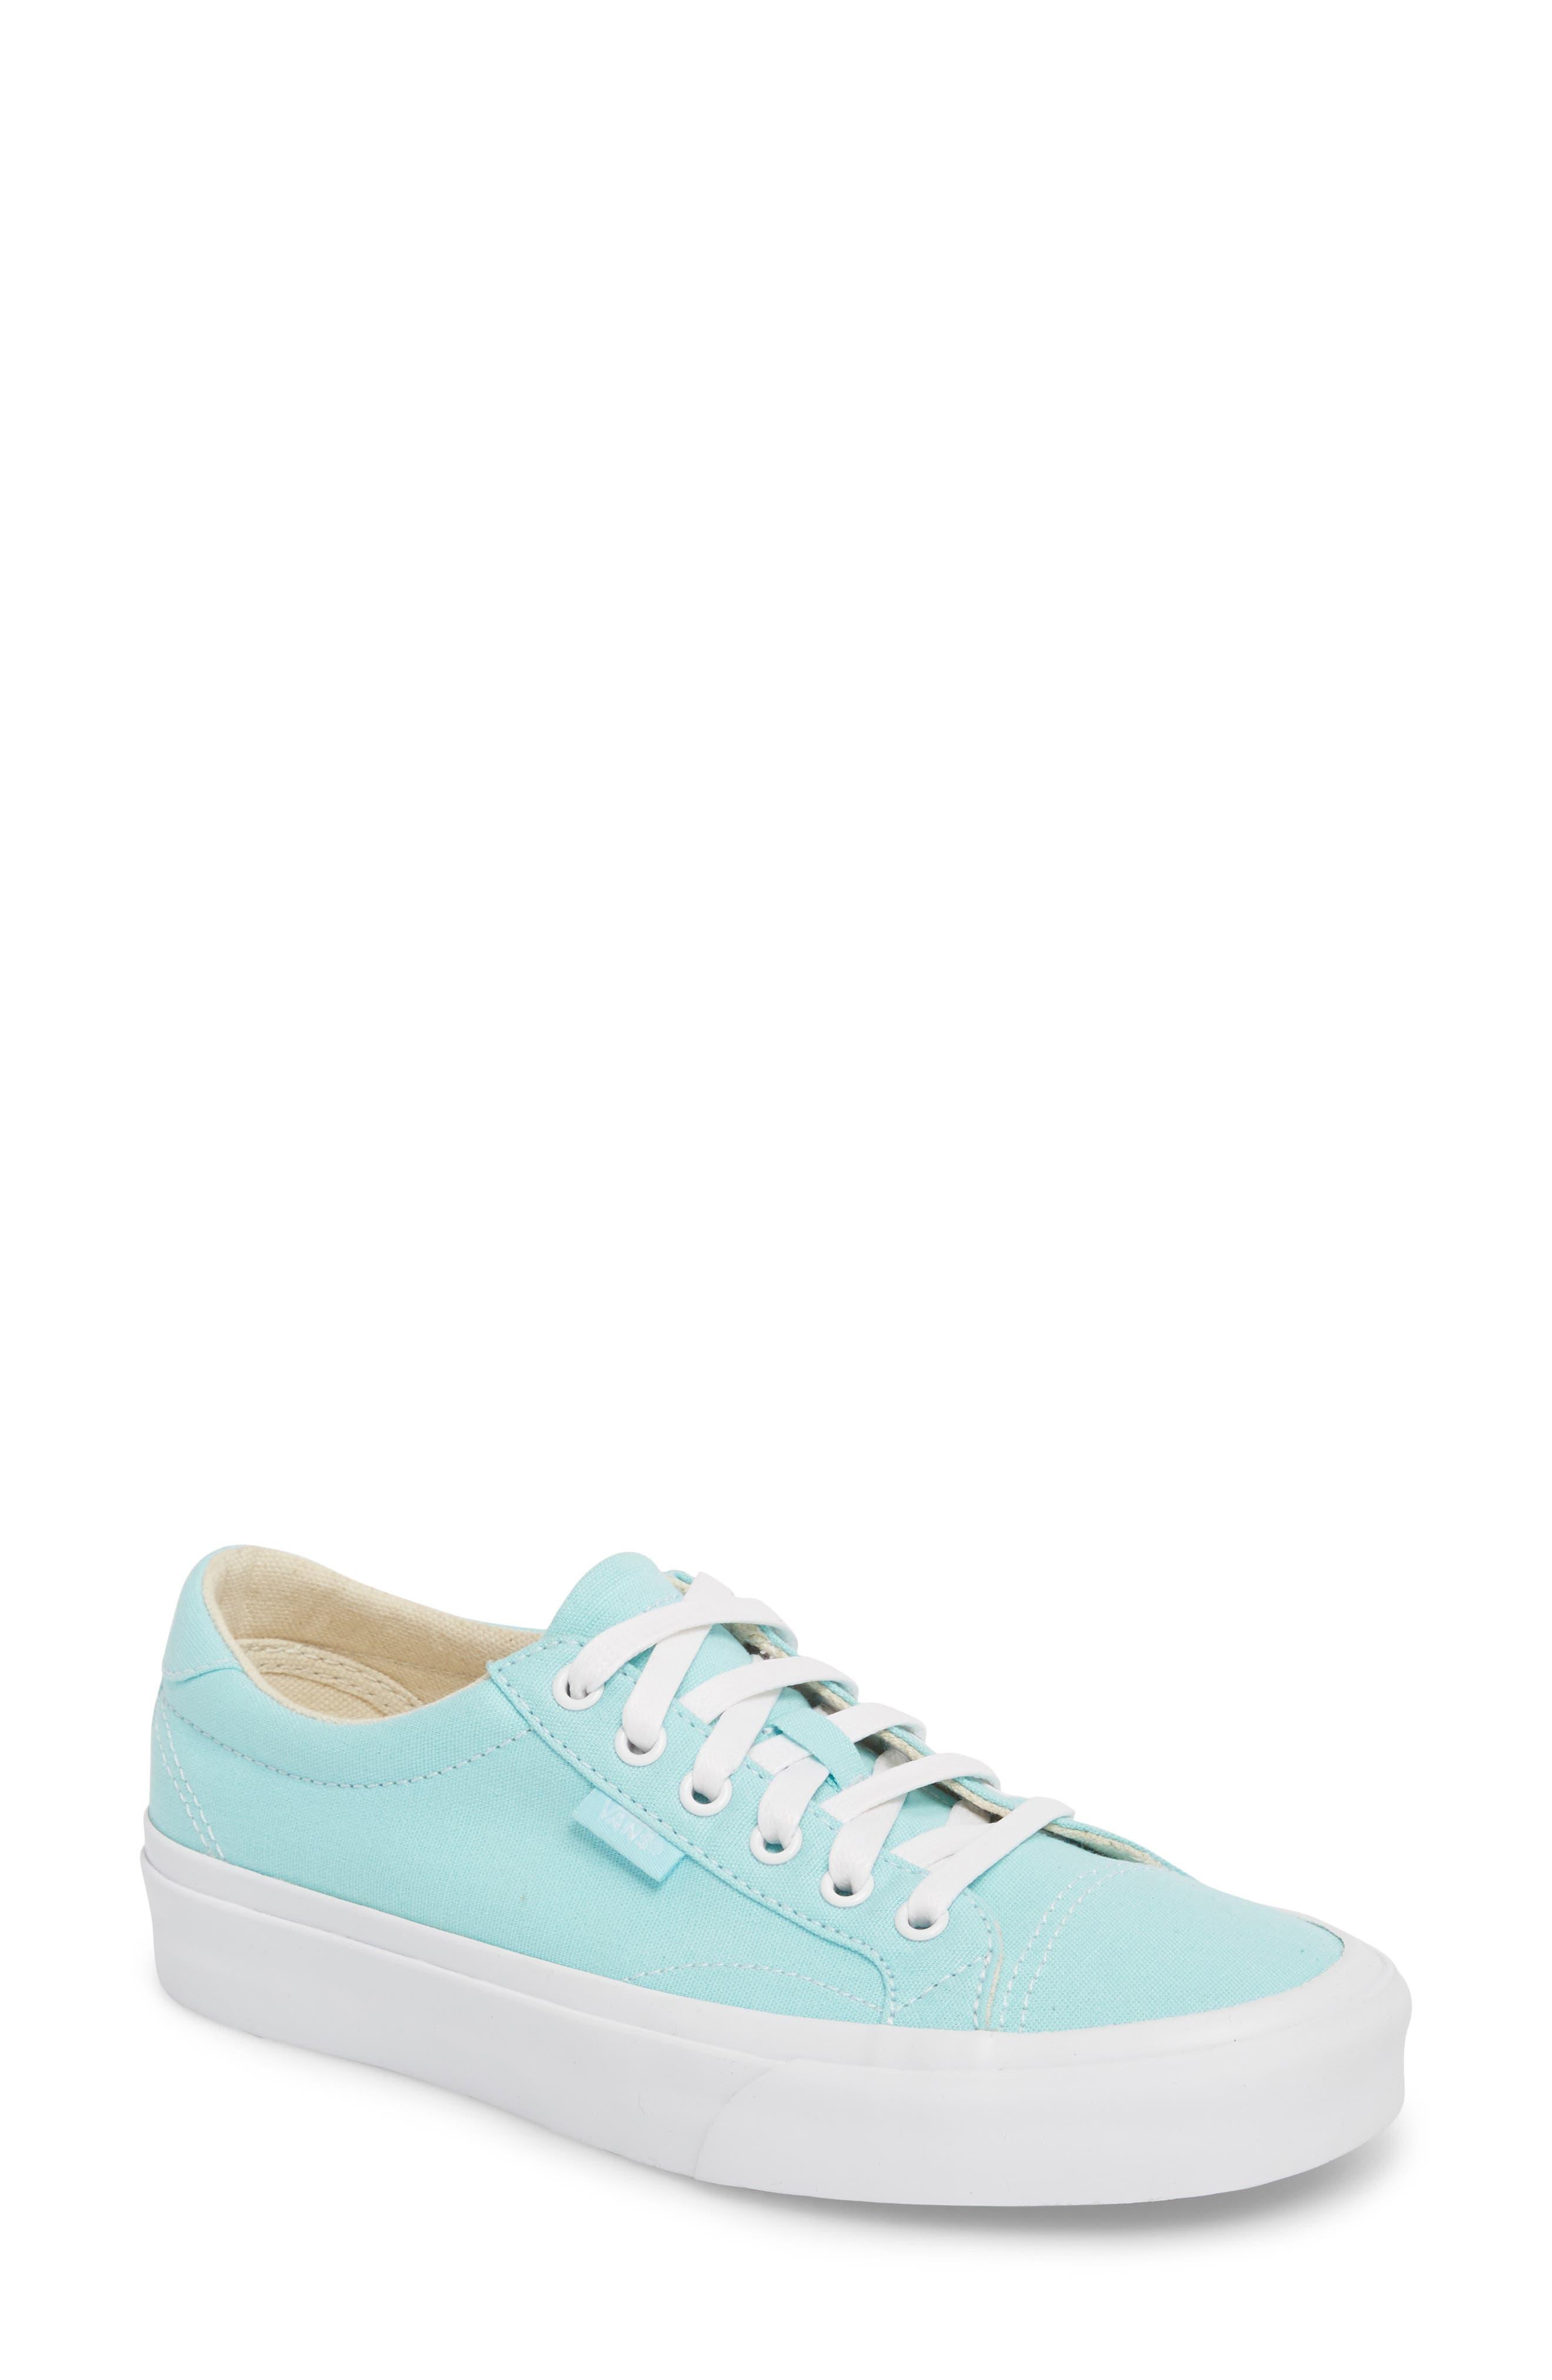 UA Court Low Top Sneaker,                         Main,                         color,